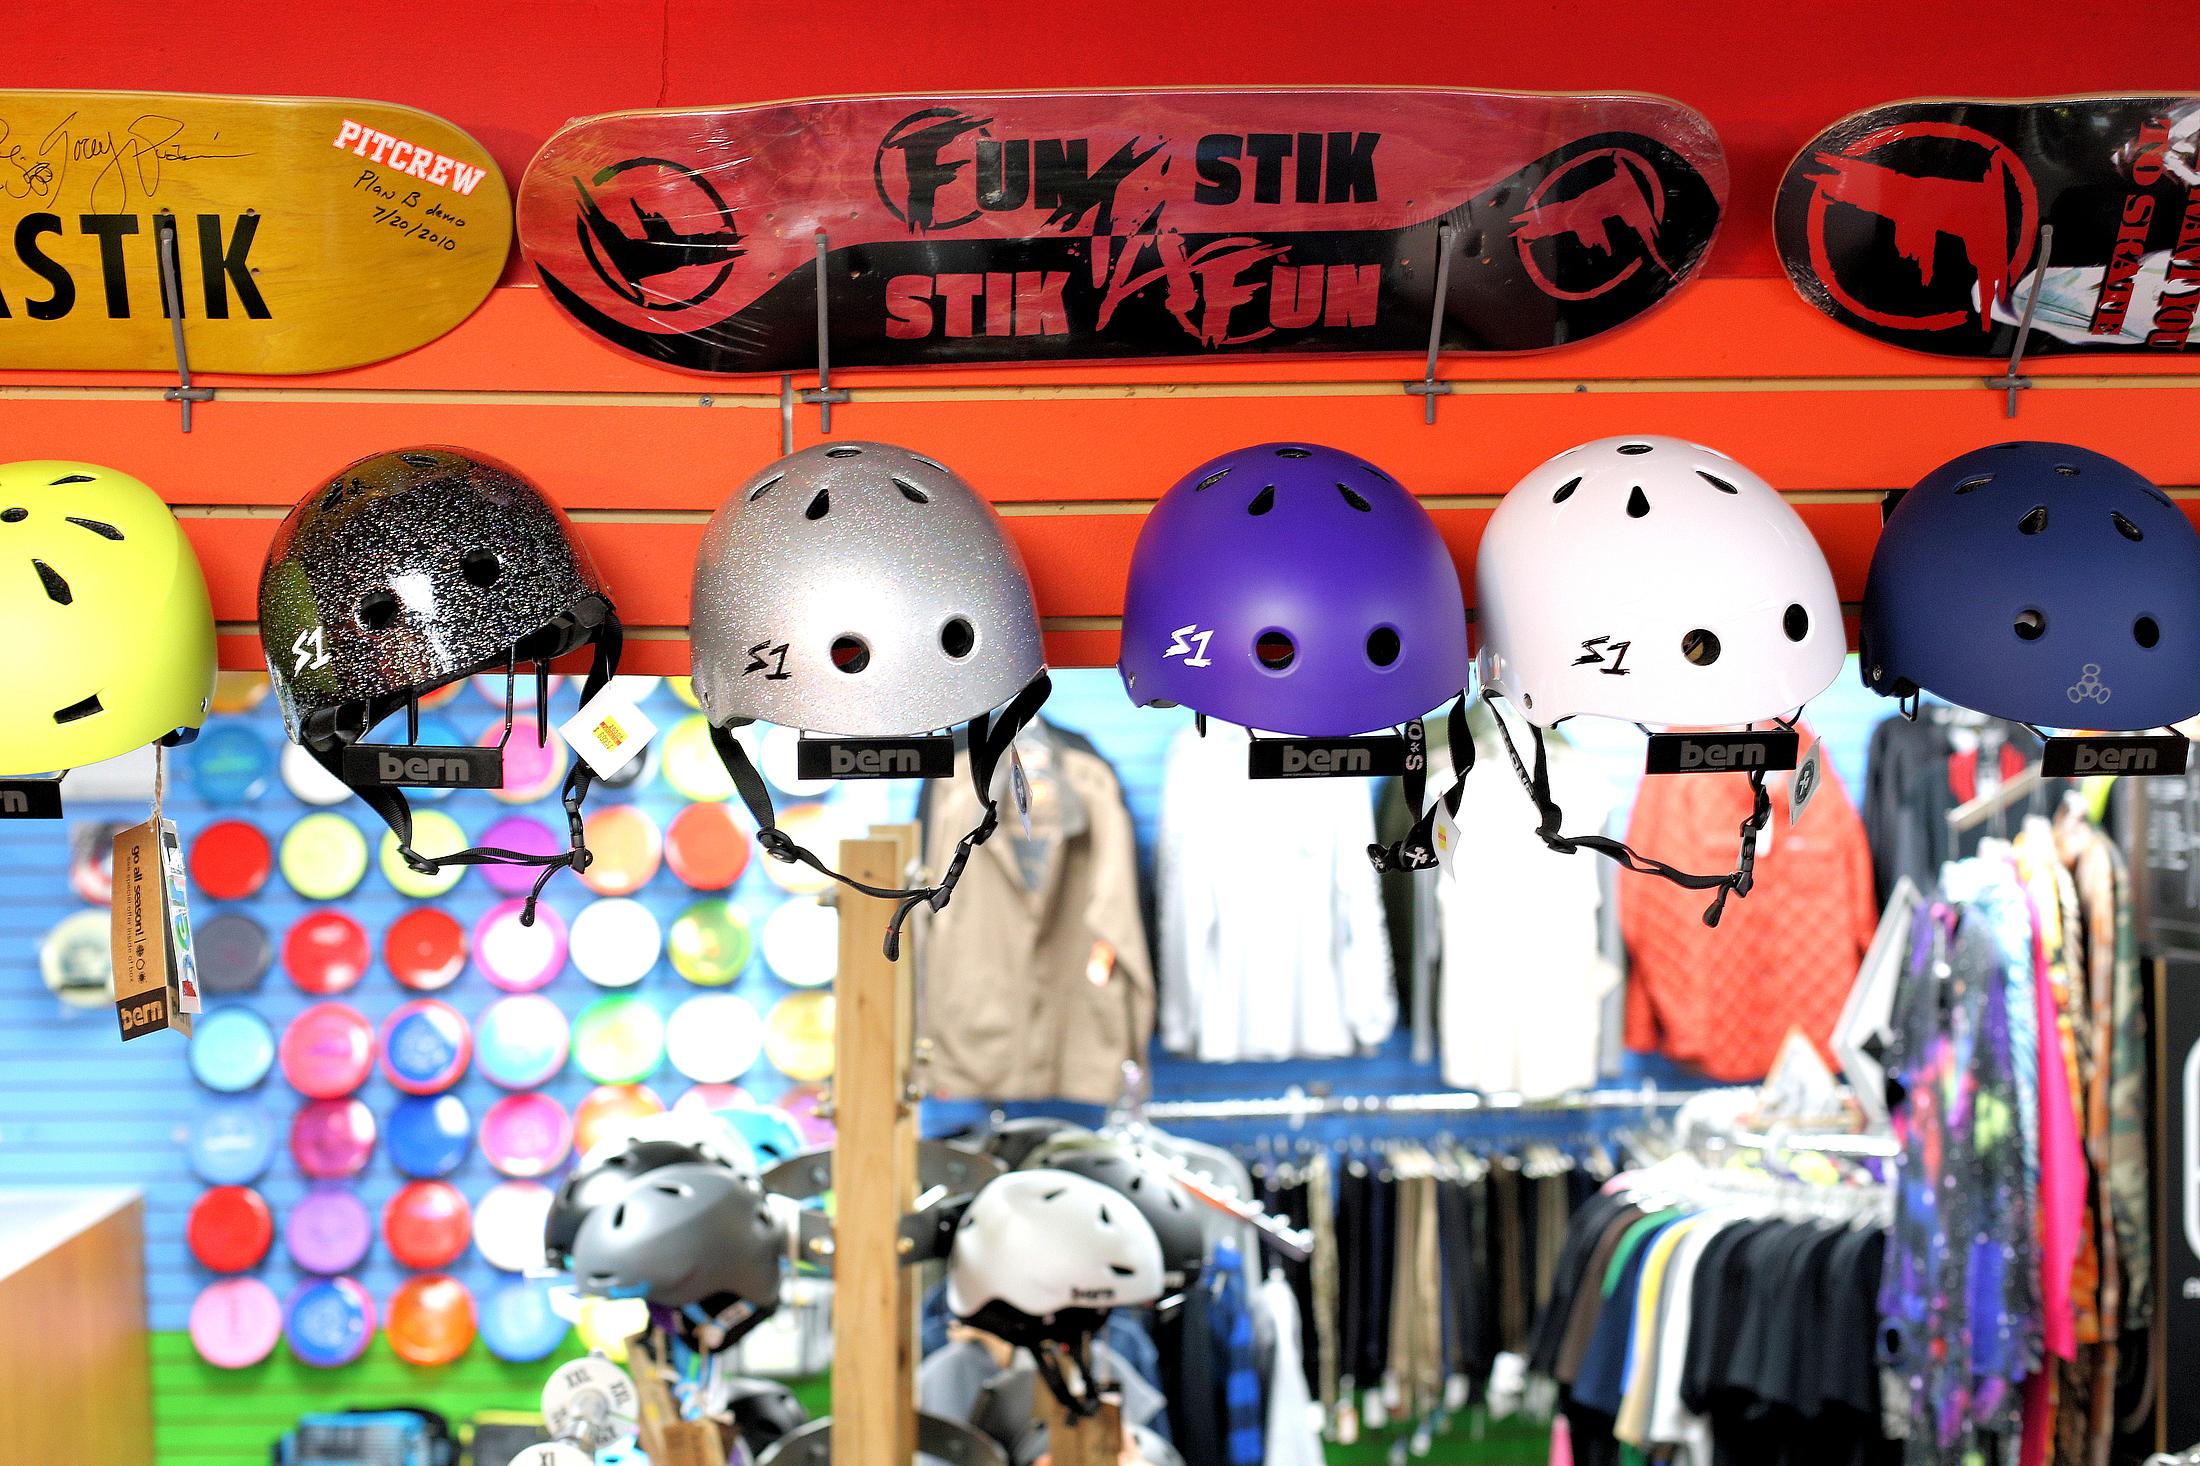 Funtastik Skate Shop